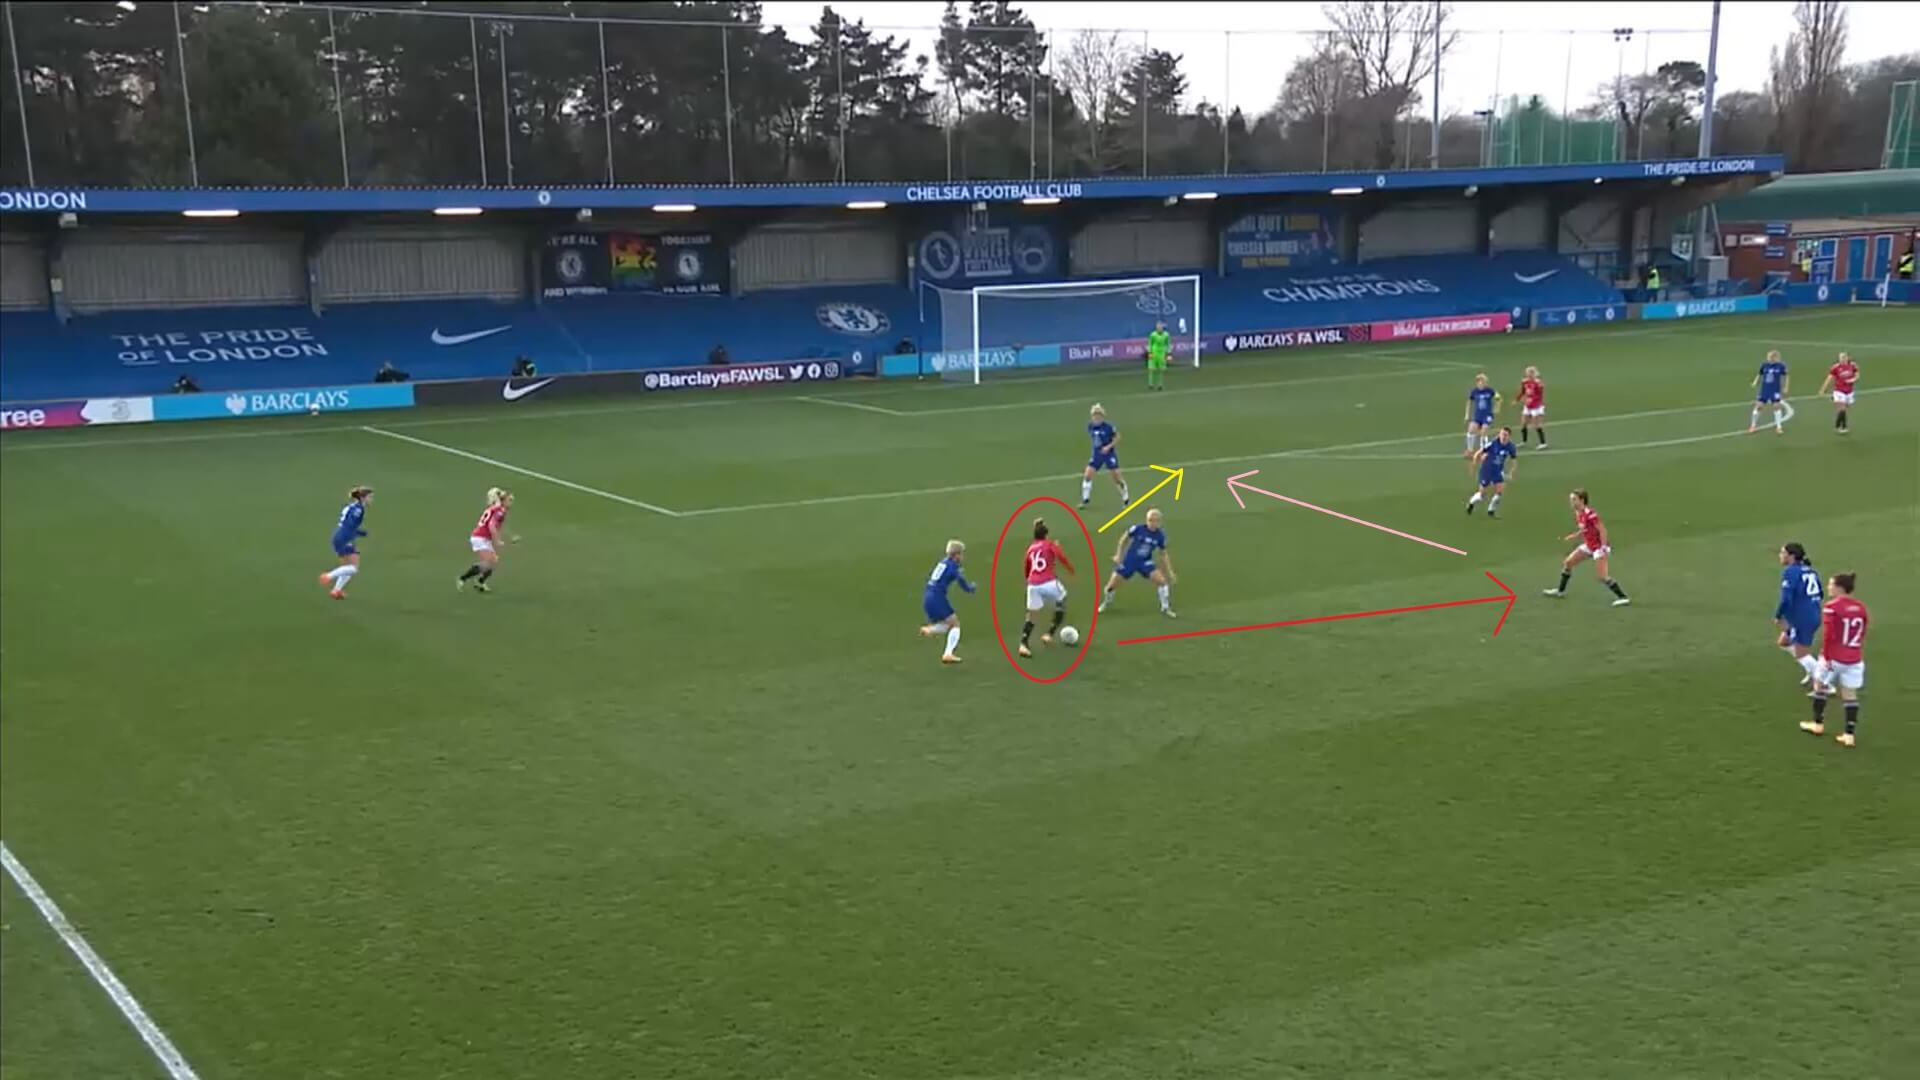 FAWSL 2020/2021: Chelsea Women v Manchester United Women - tactical analysis tactics